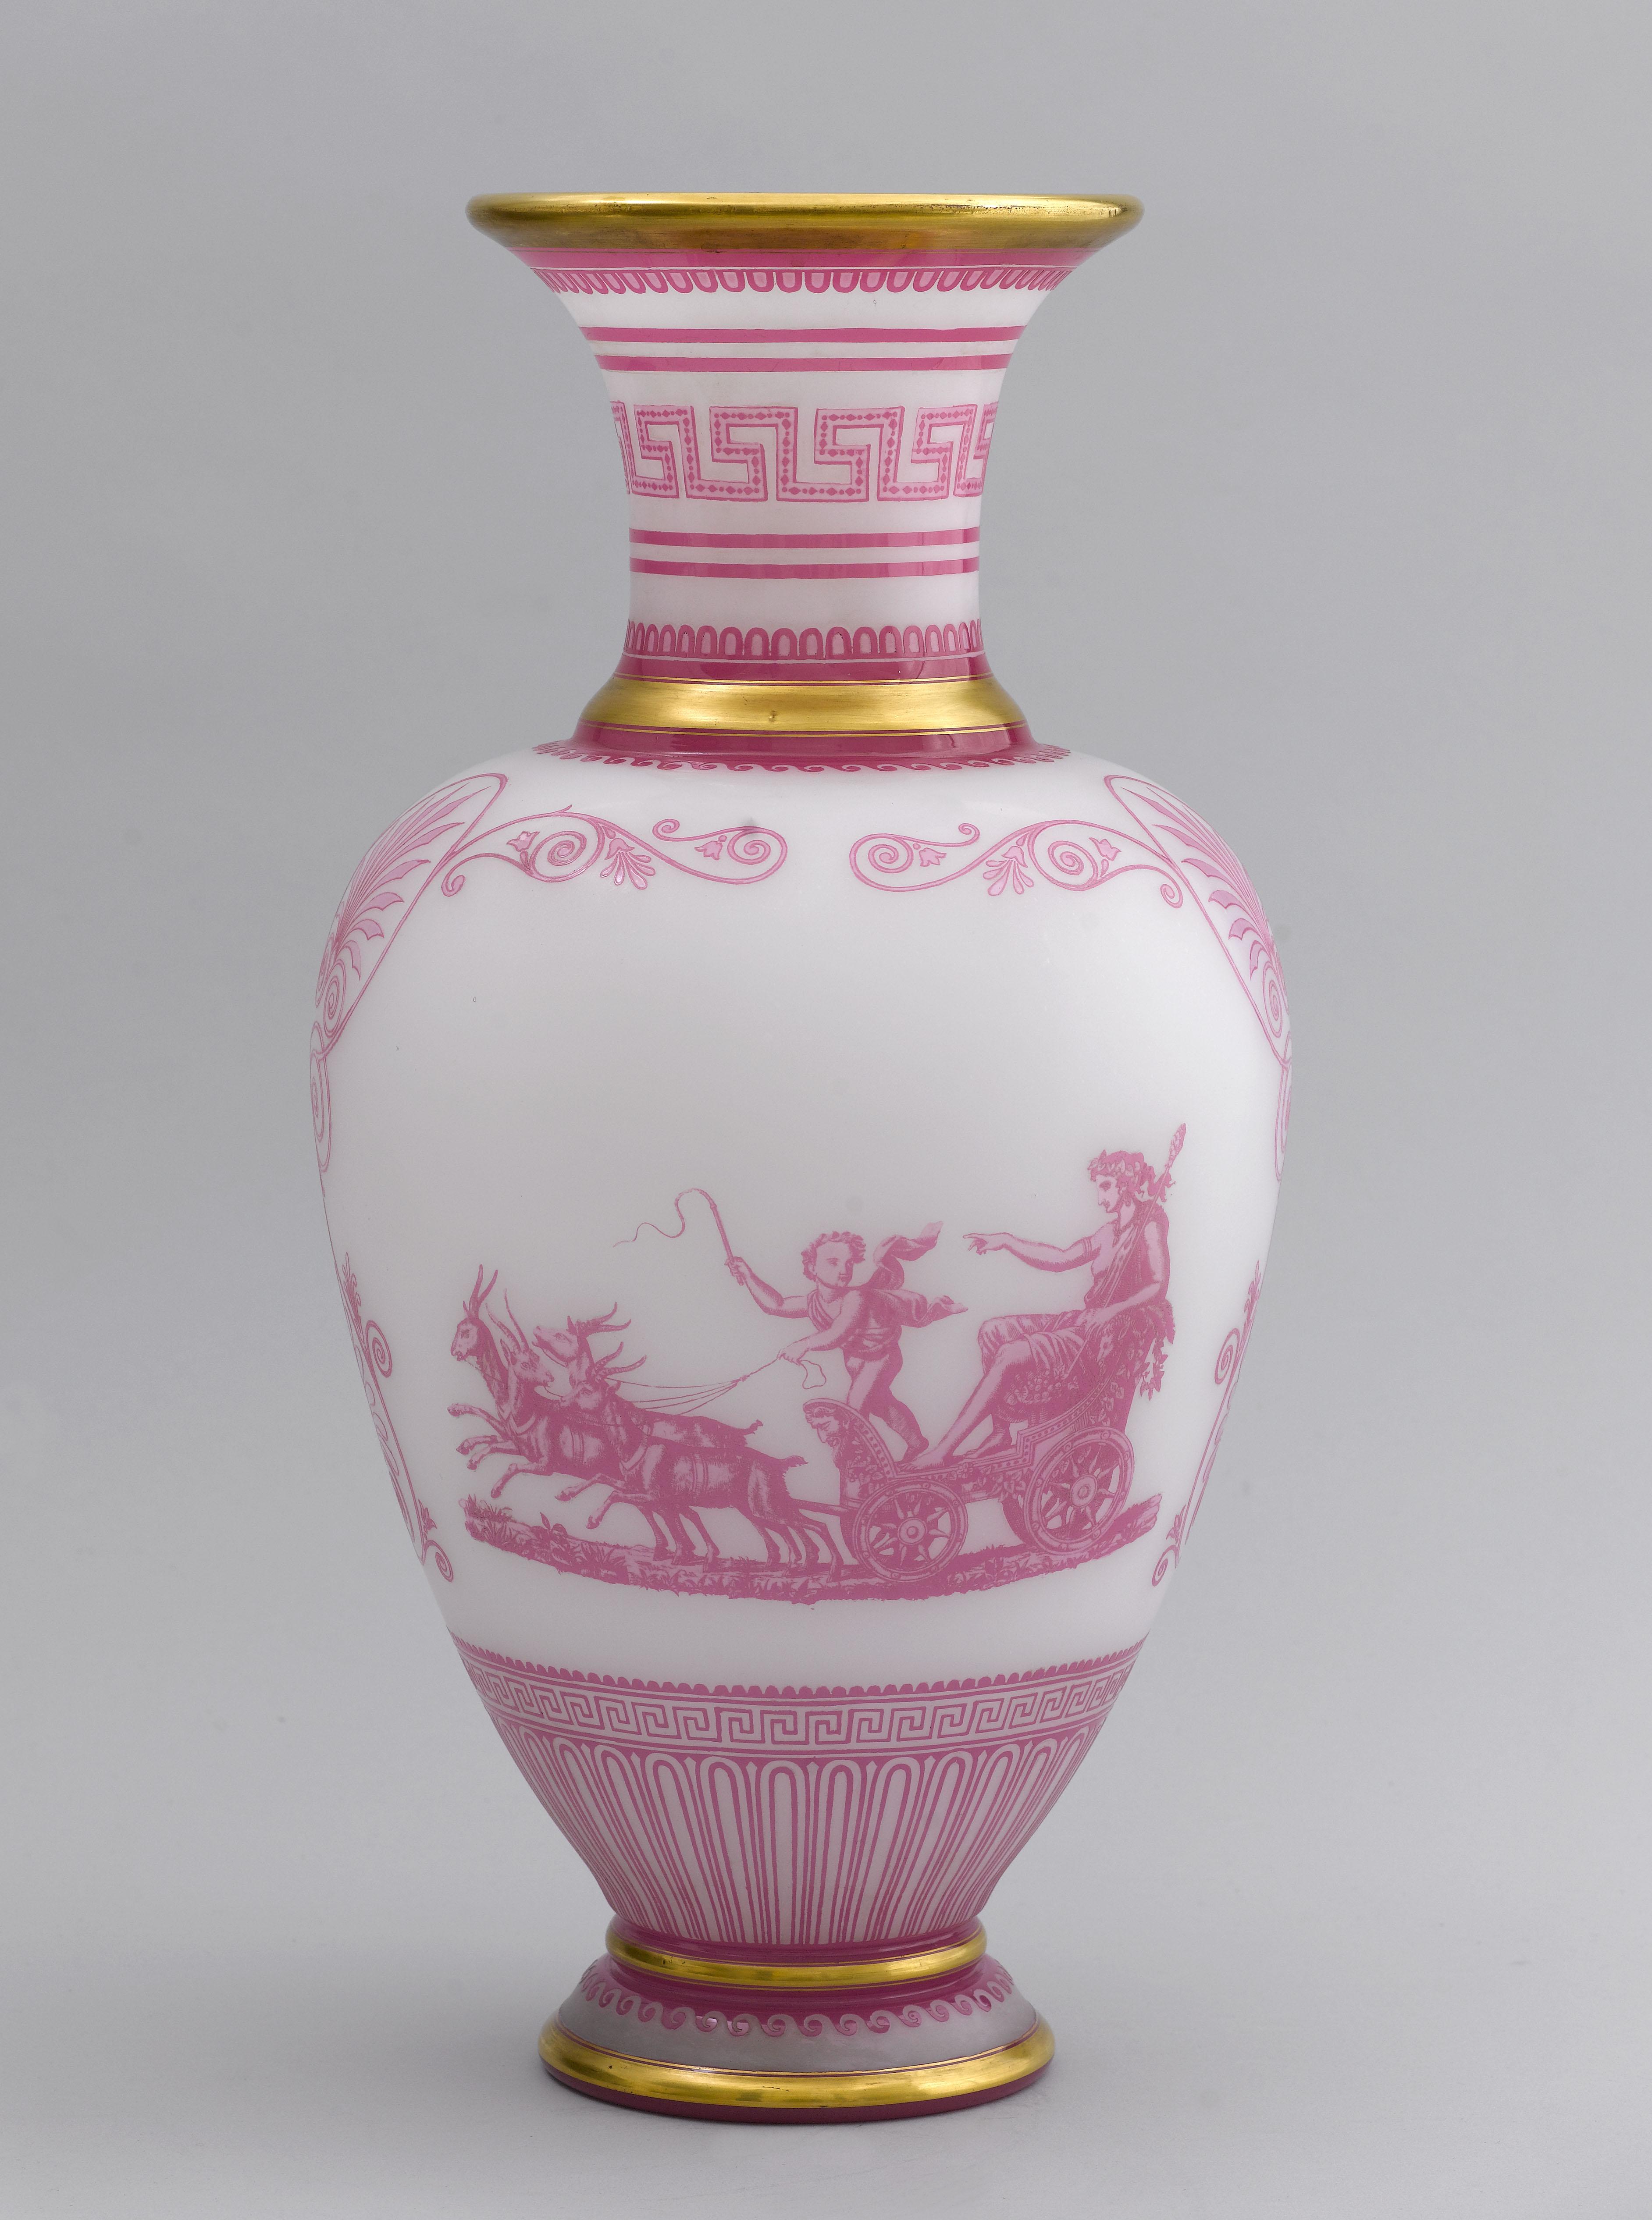 Cristalleries de Baccarat - Vase néo-grec